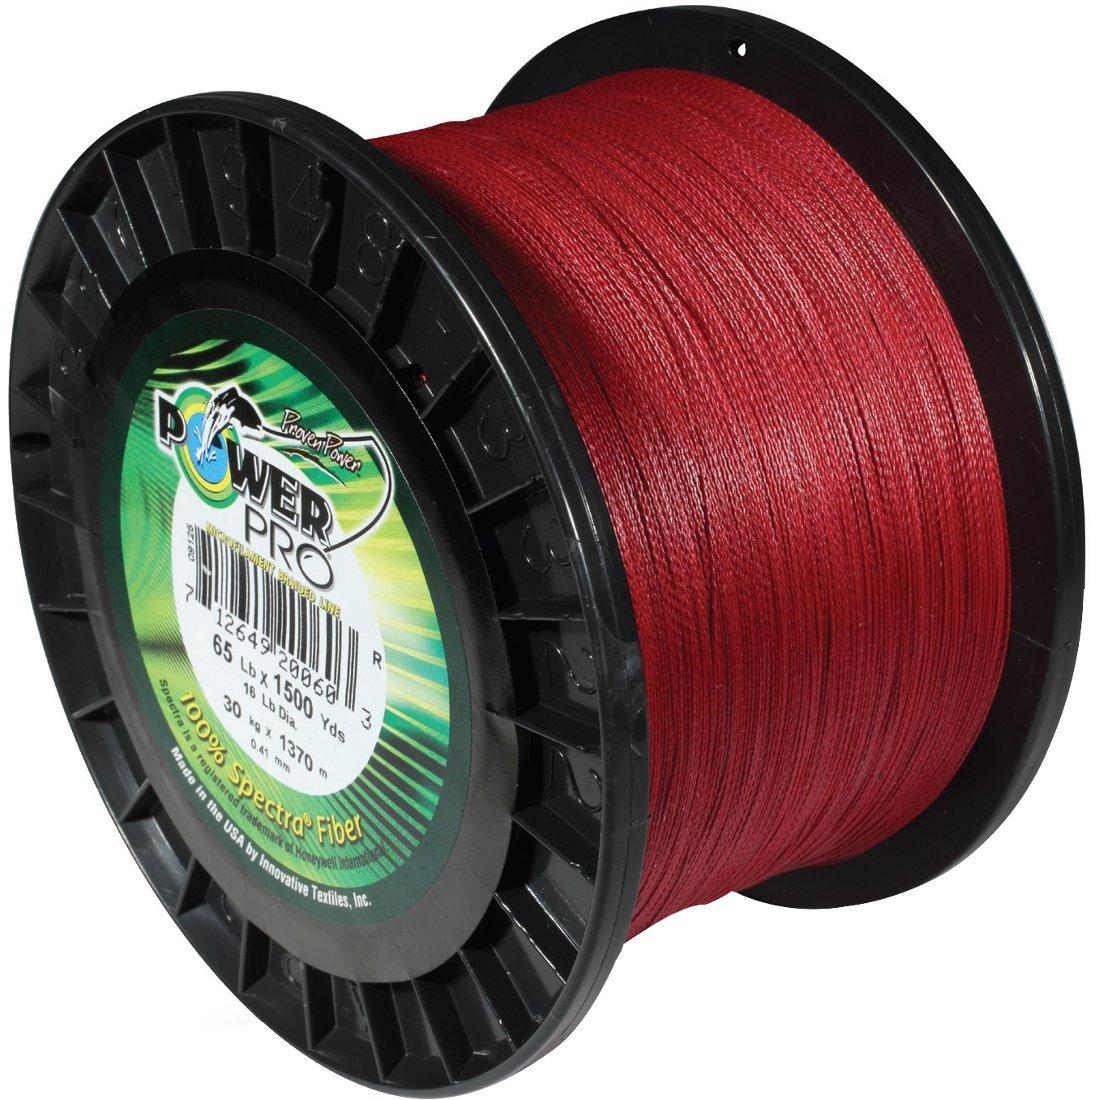 NEW POWER PRO SPECTRA BRAID VERMILLION RED 20LB 300YDS 21100200300V